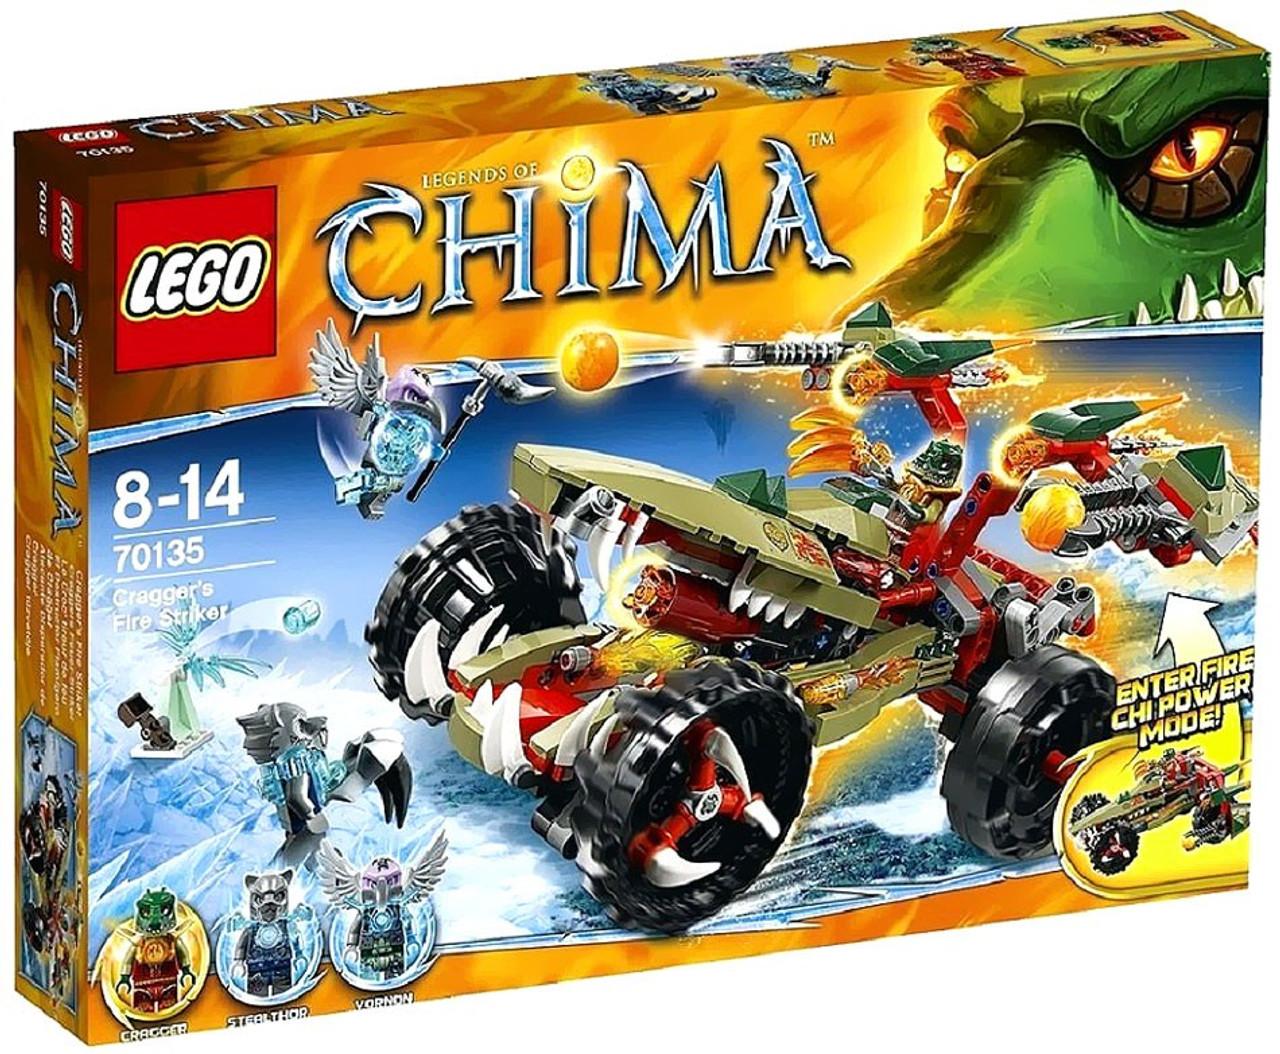 LEGO Legends of Chima Cragger's Fire Striker Set #70135